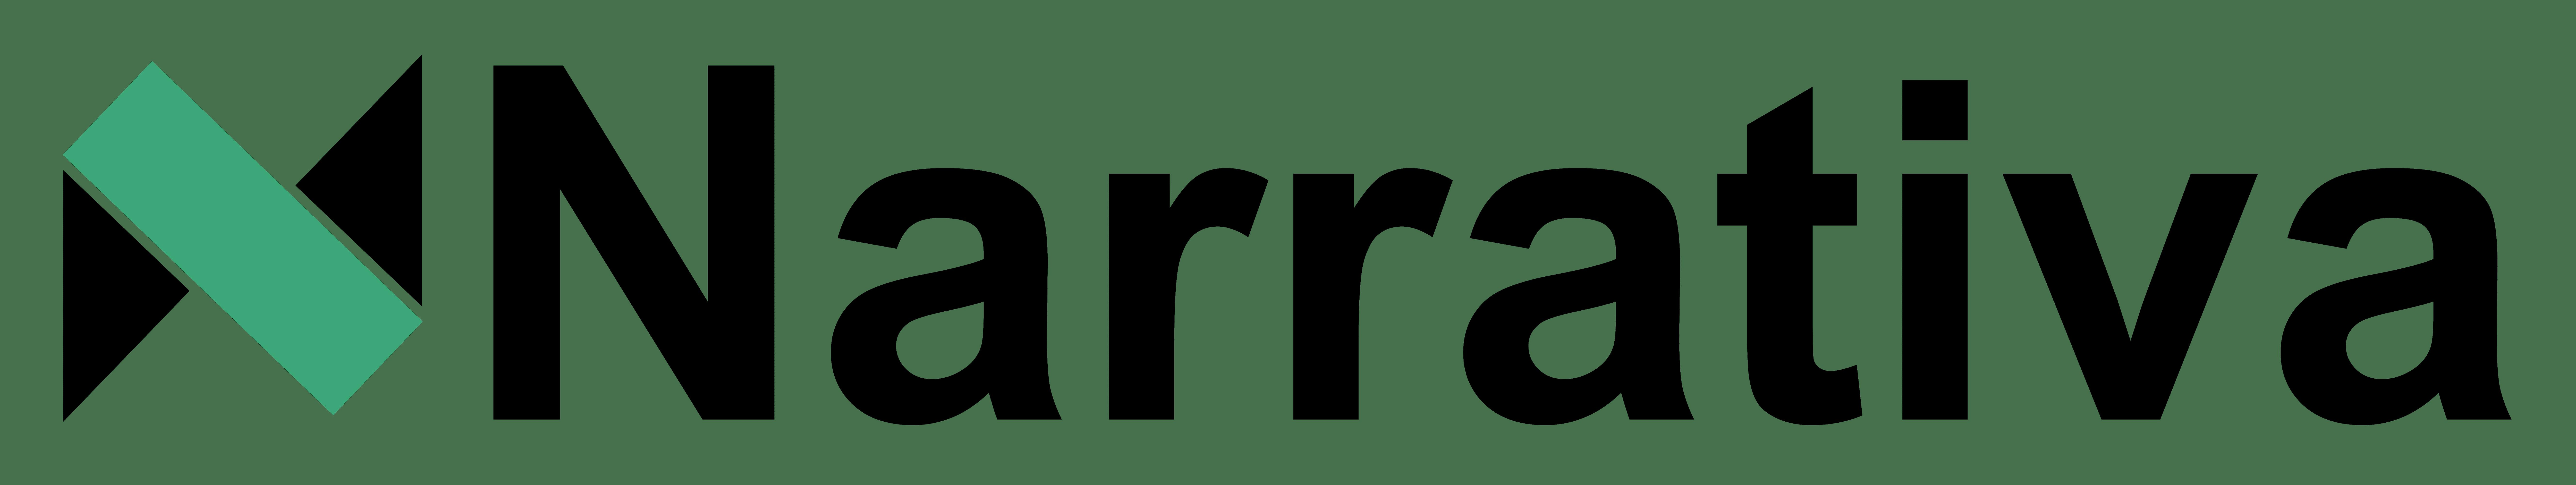 Narrativa logo